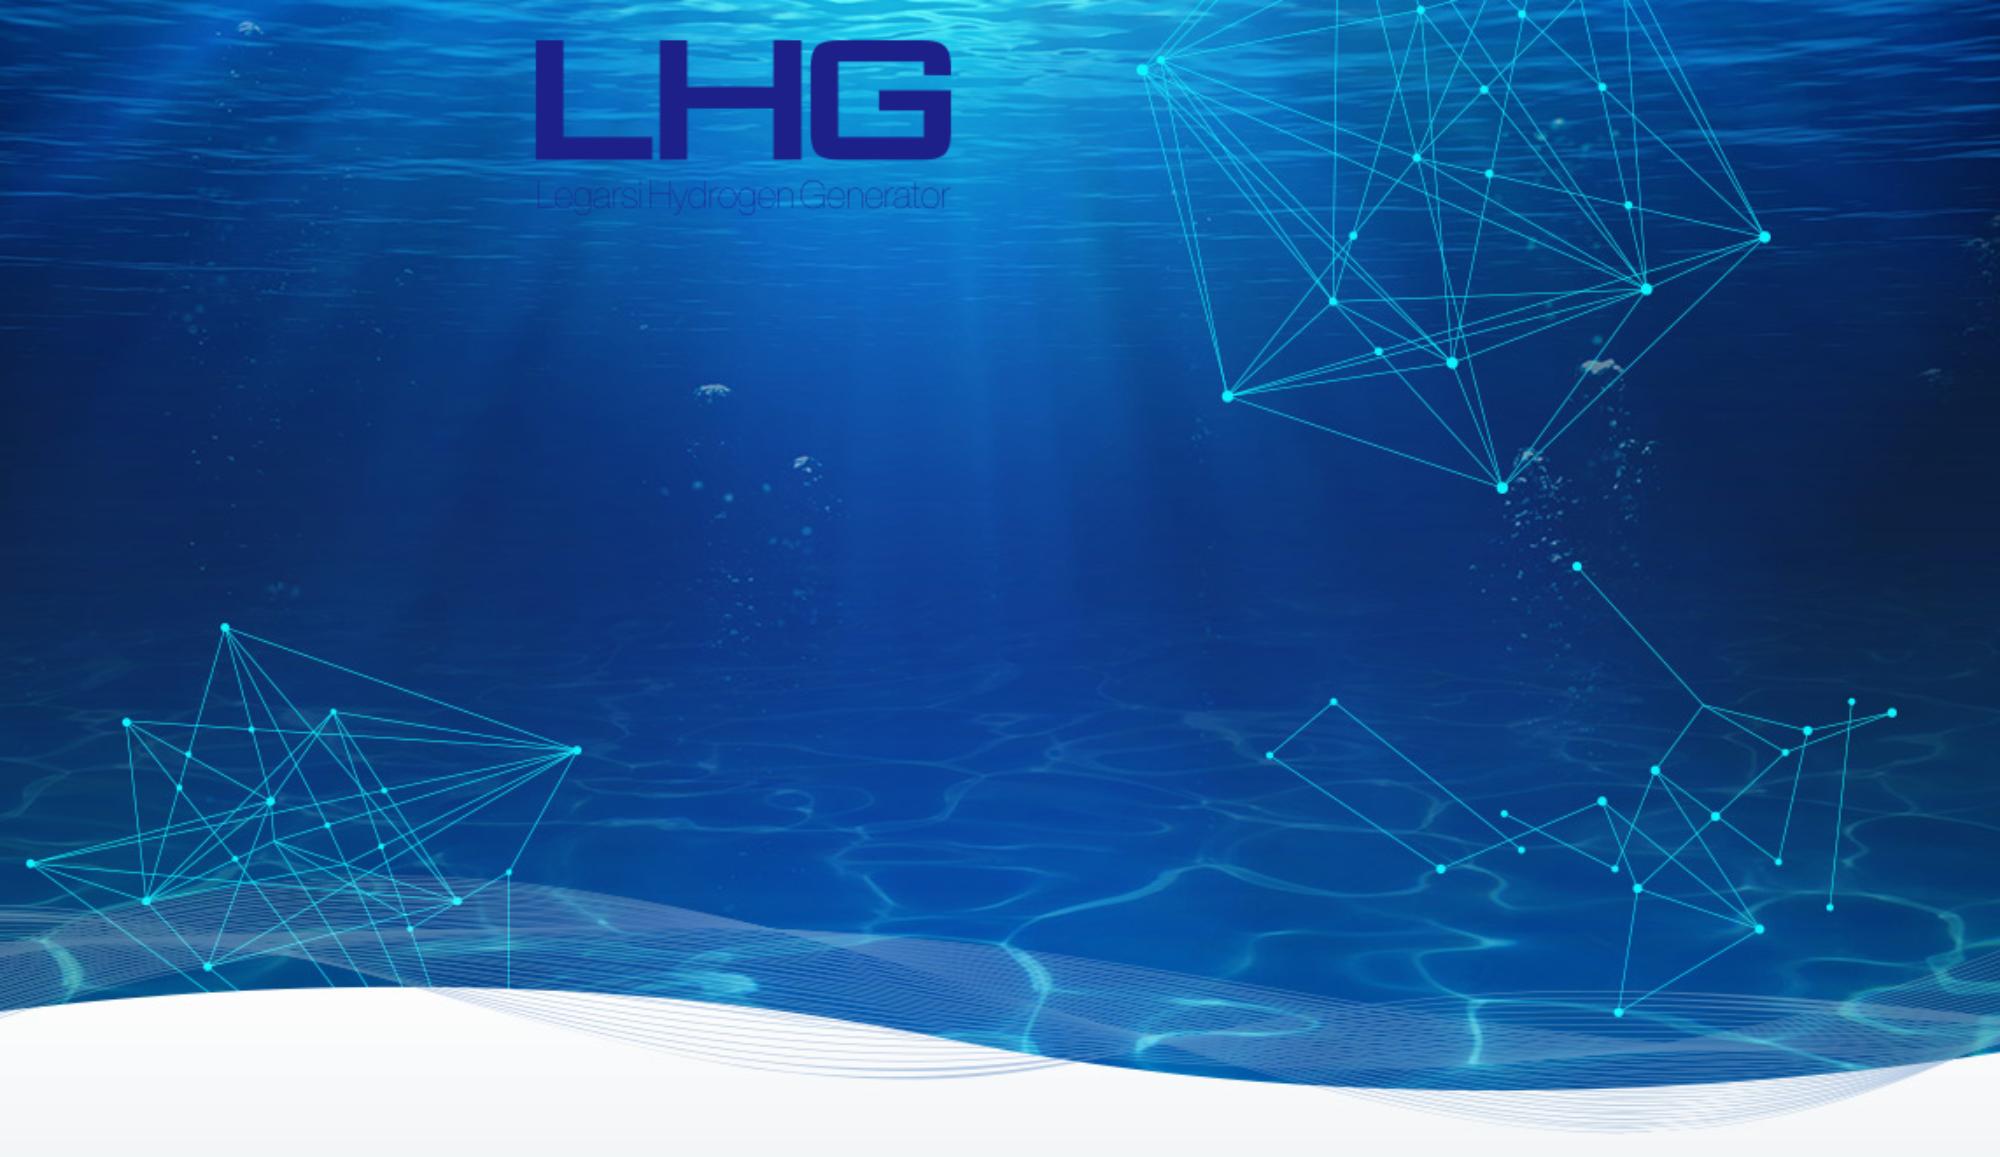 LHG Information